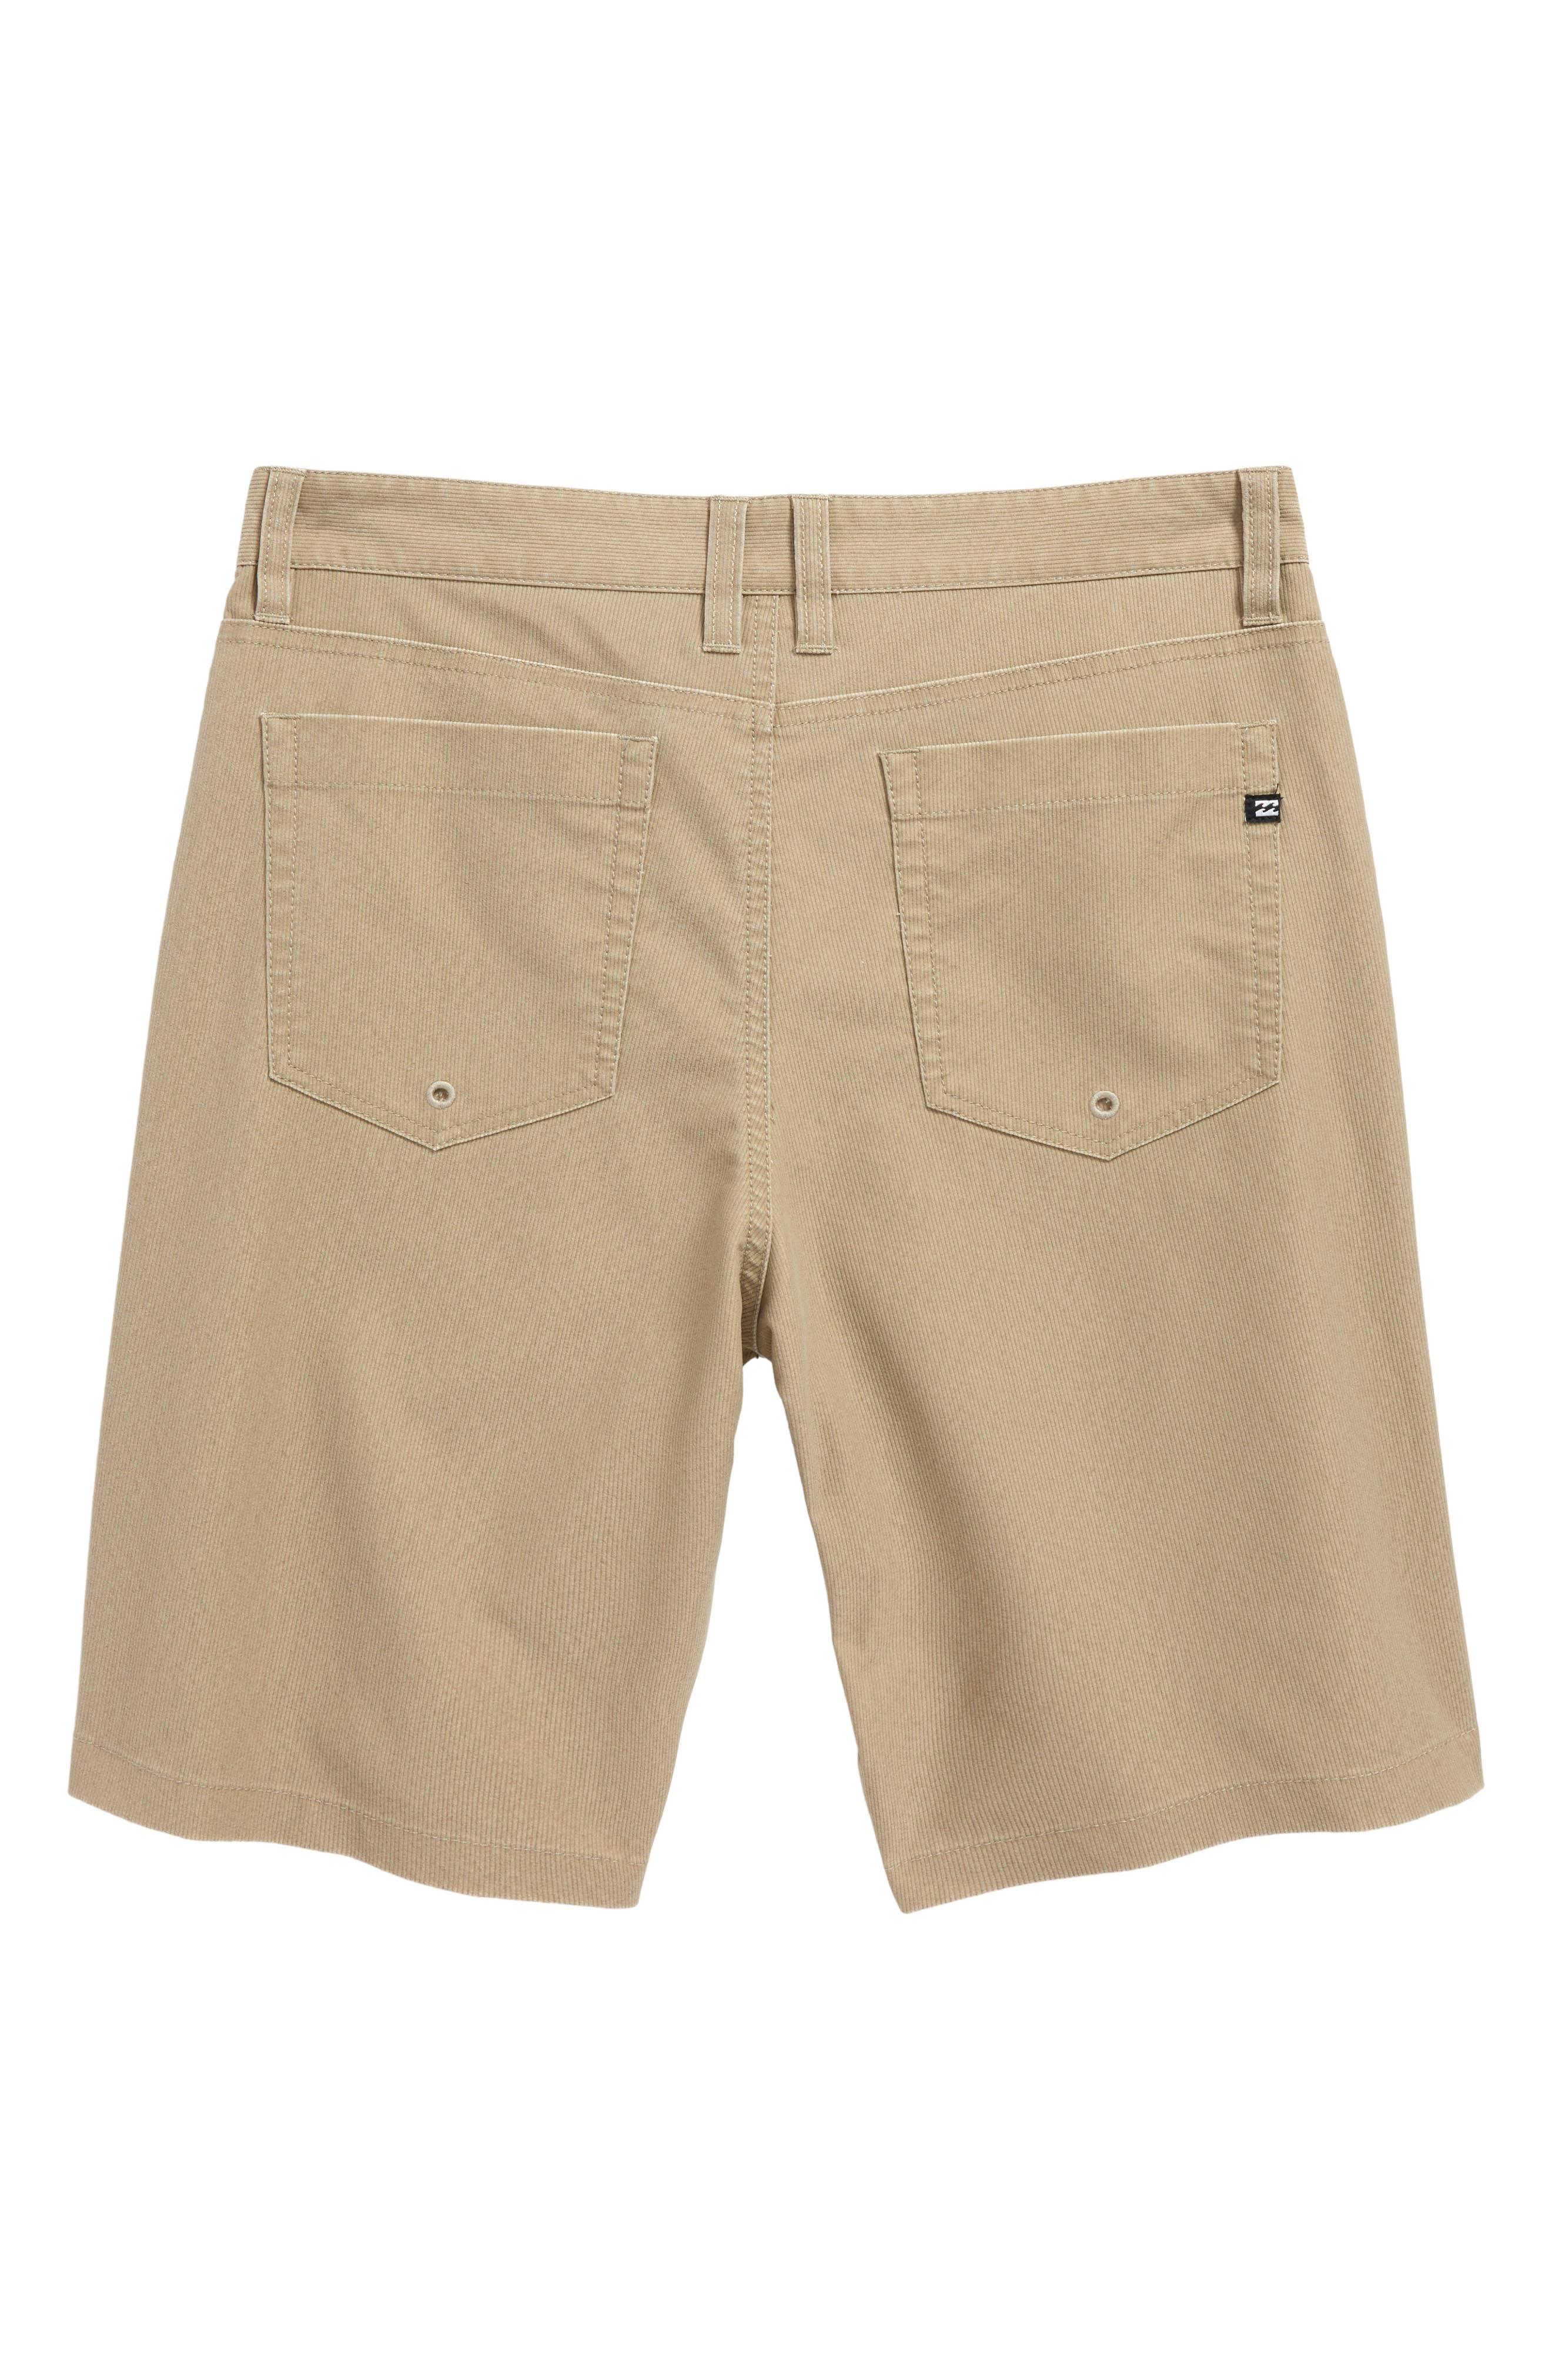 Outsider X Surf Corduroy Hybrid Shorts,                             Alternate thumbnail 2, color,                             259